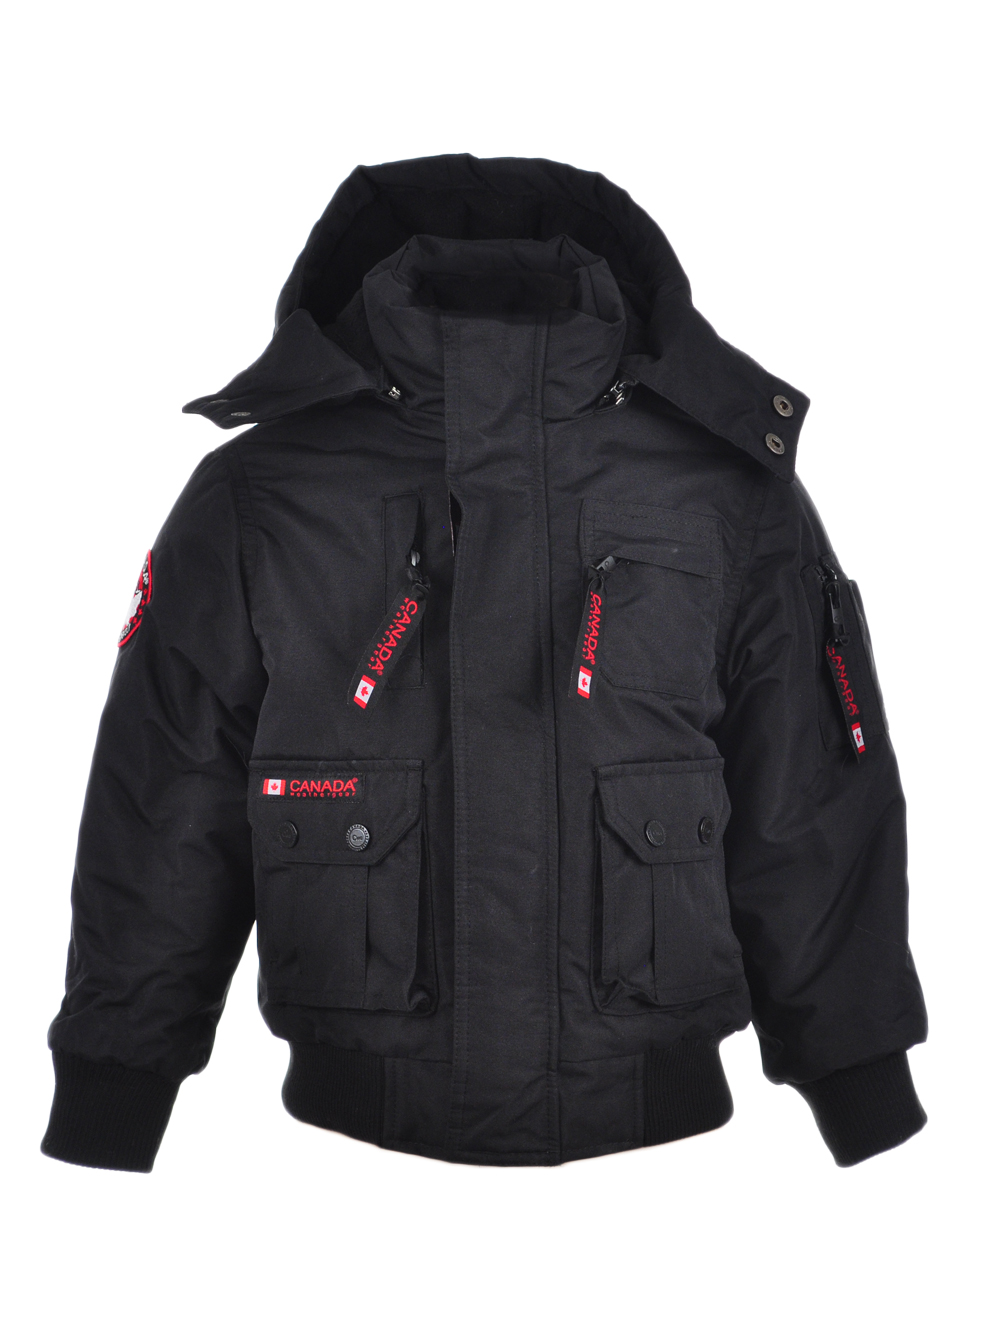 Canada Weather Gear Boys' Insulated Jacket